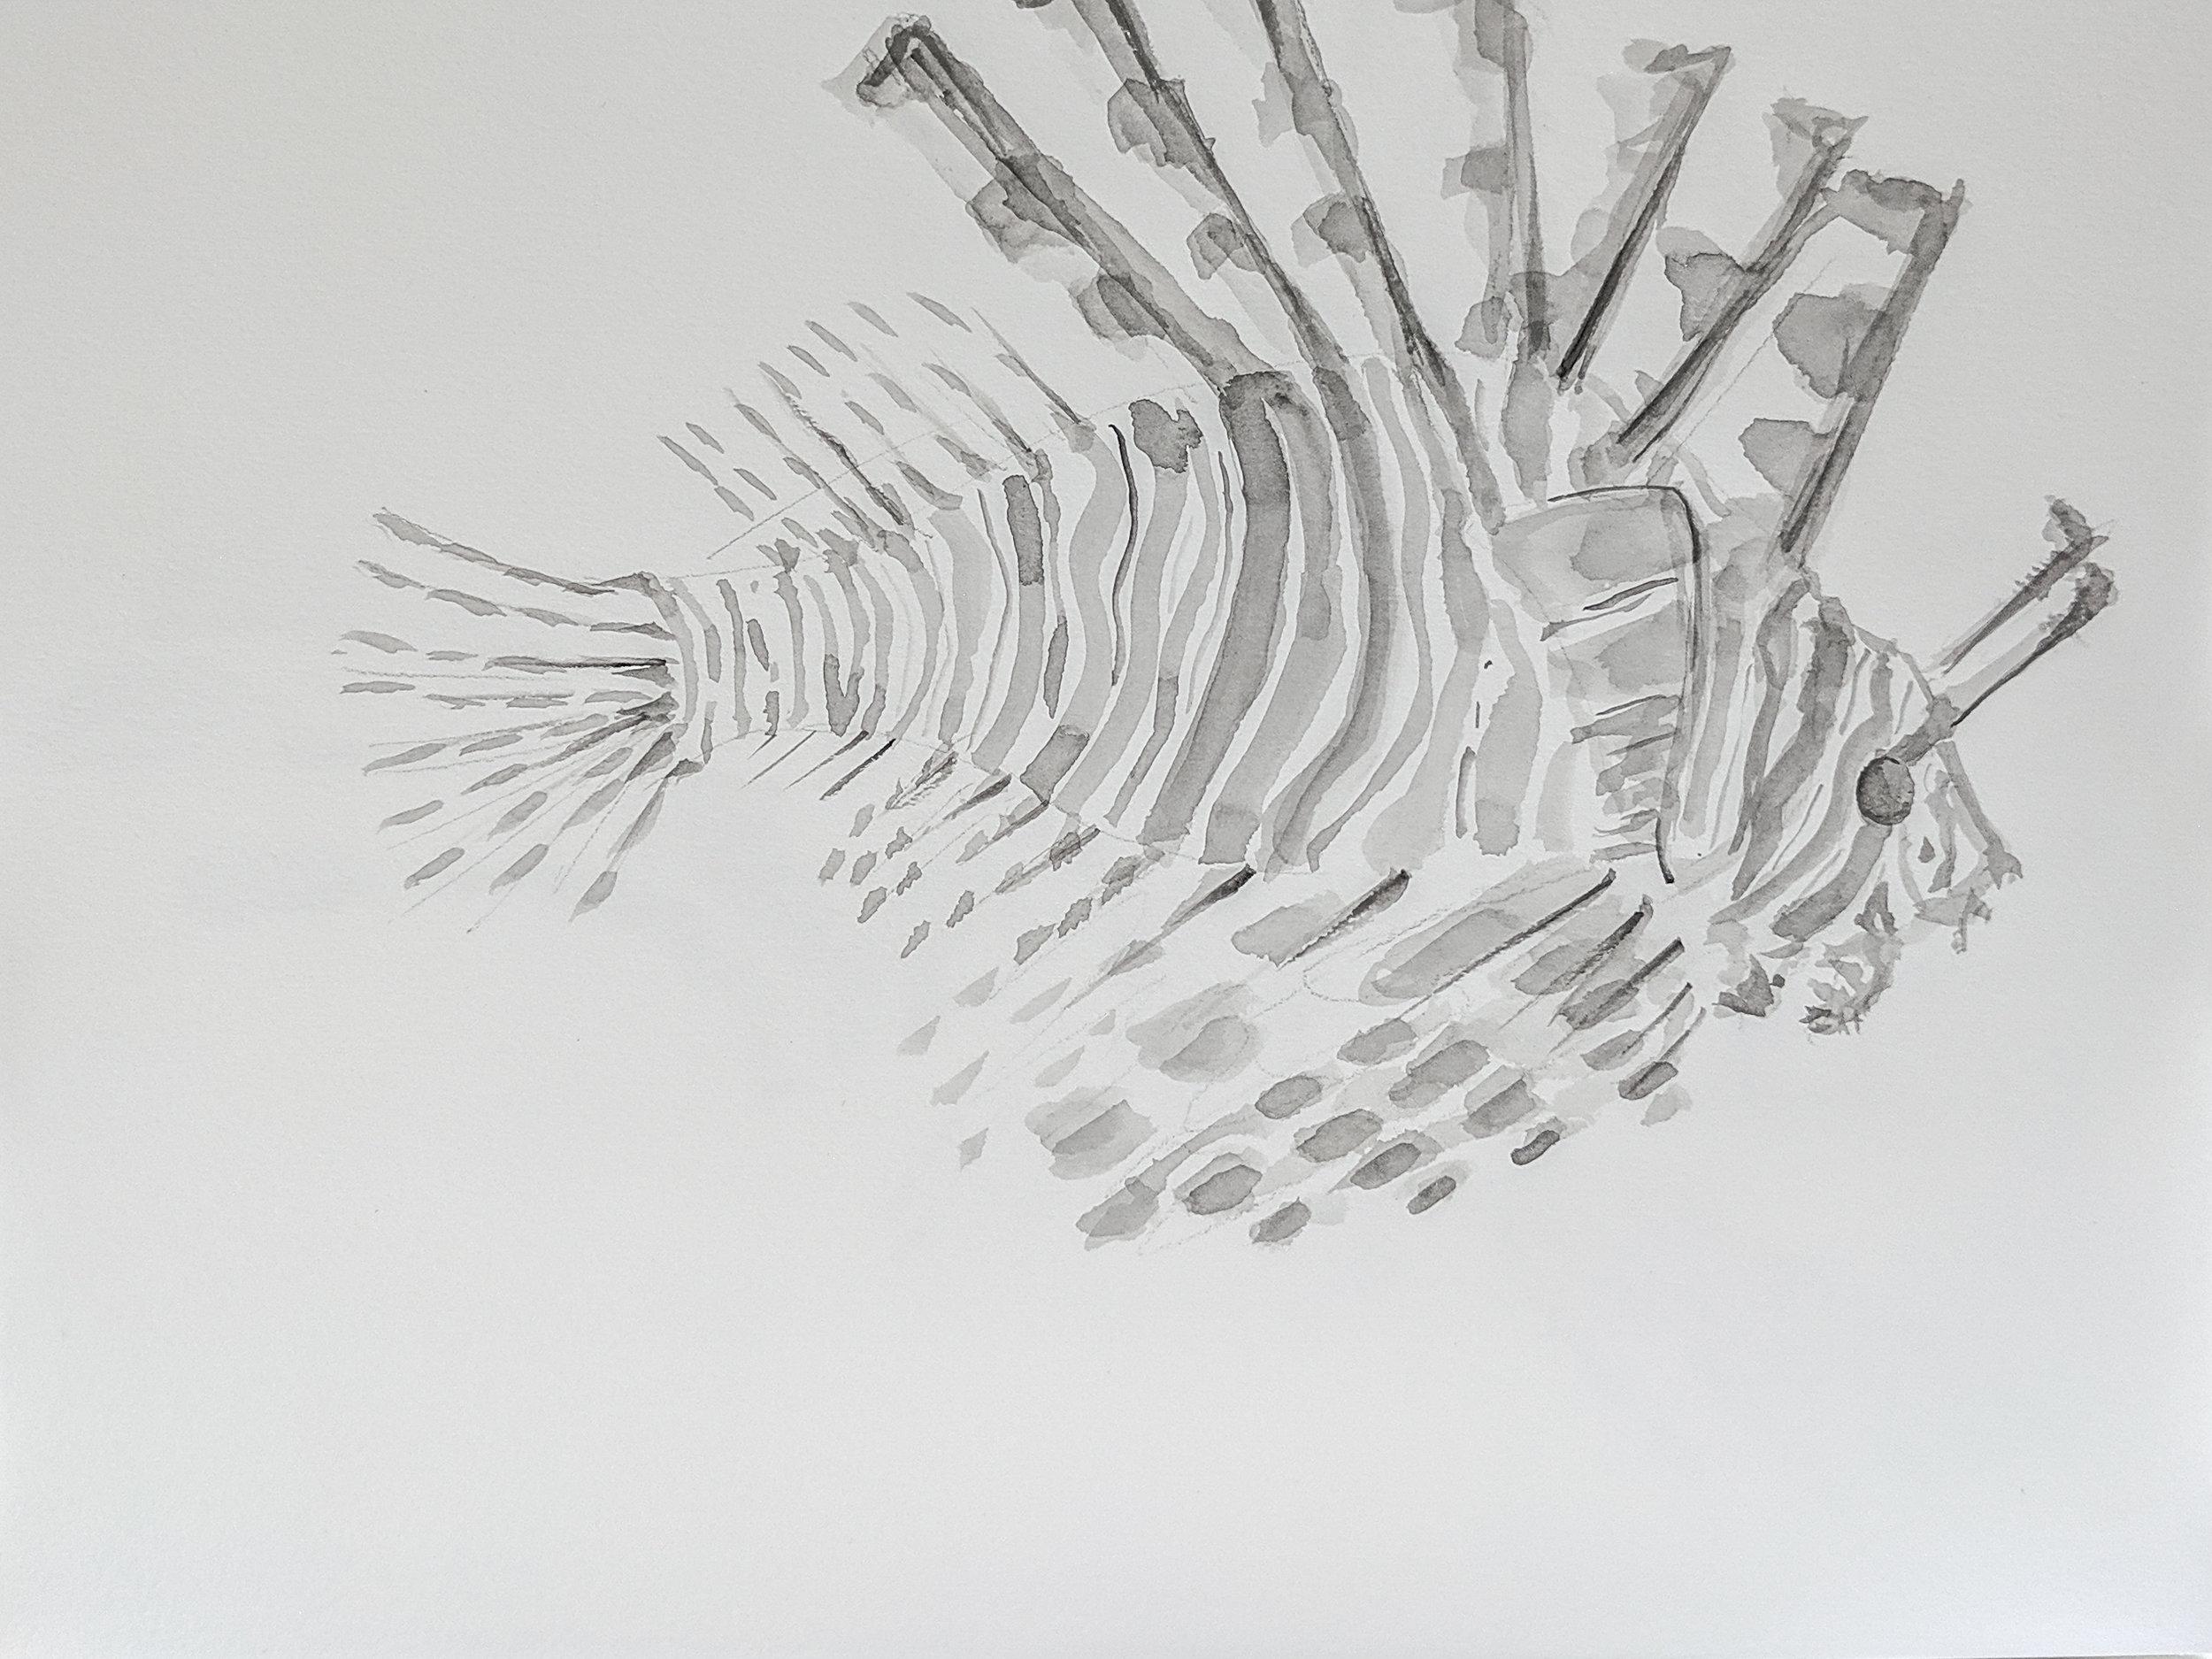 Lionfish drawing_ex_1.jpg